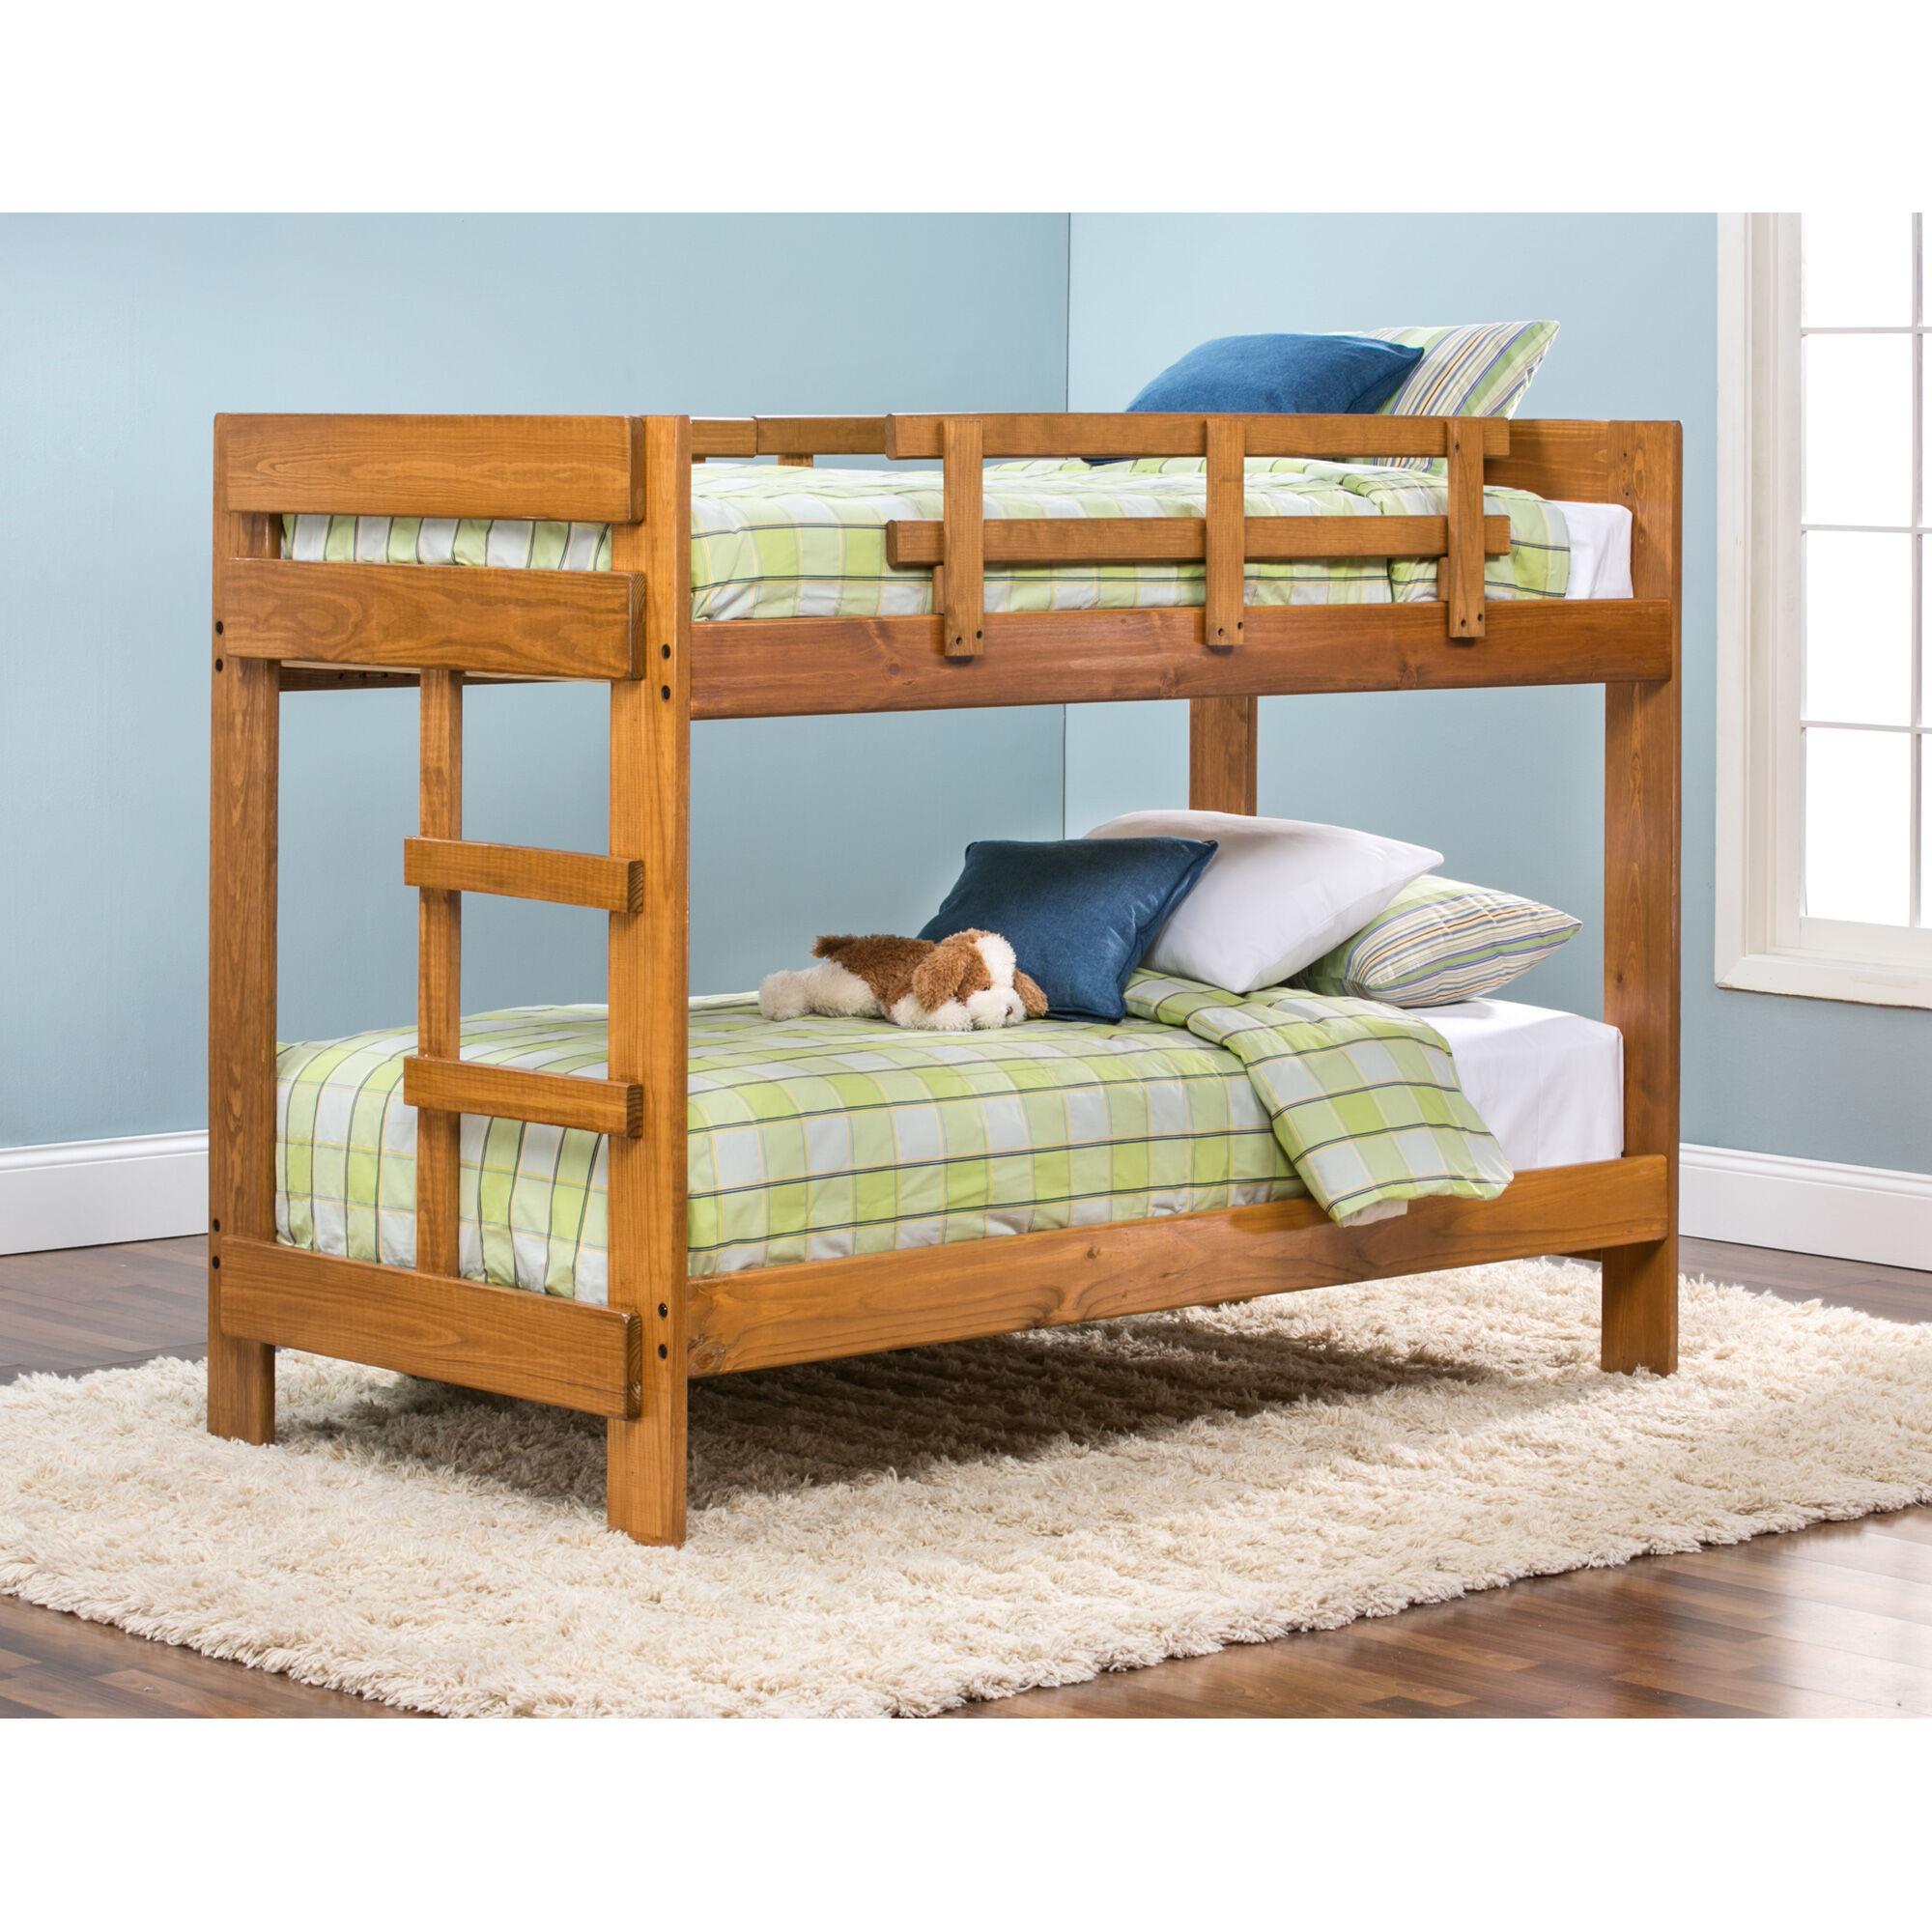 slumberland furniture tanglewood honey tw tw bunk bed Slumberland Bunk Beds id=17089